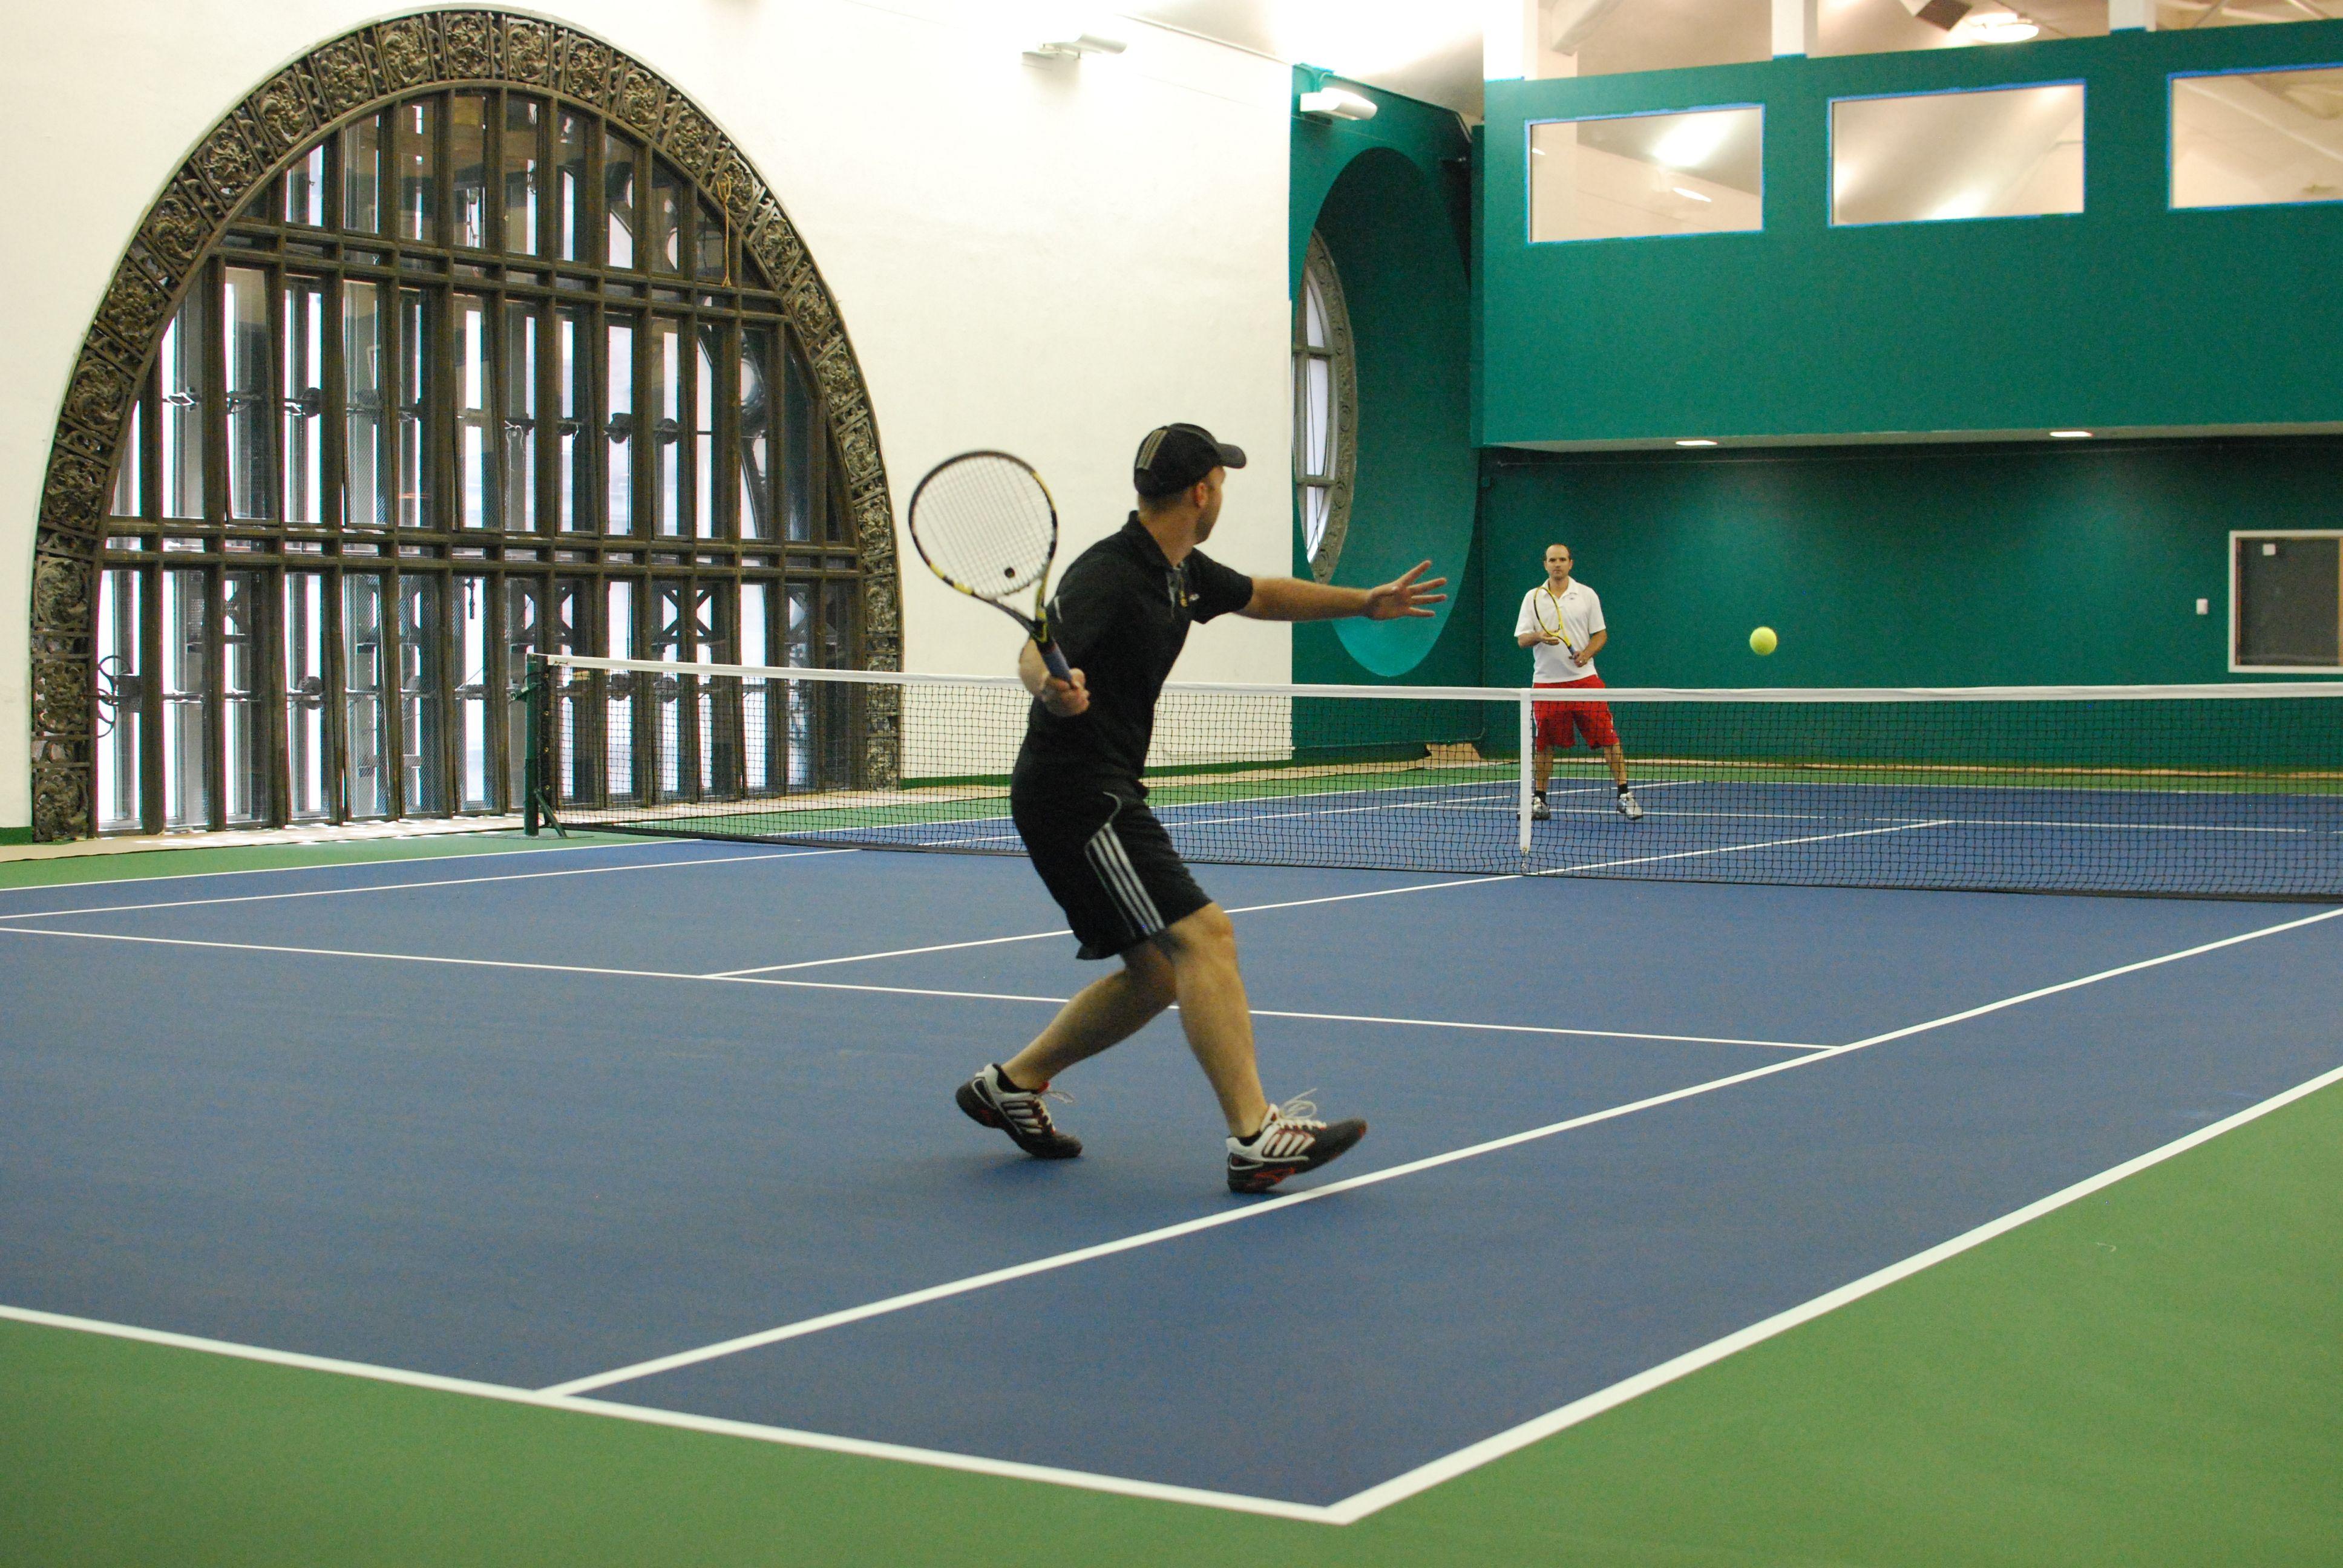 Vanderbilt Tennis Club With Images Tennis Court Tennis Clubs Tennis